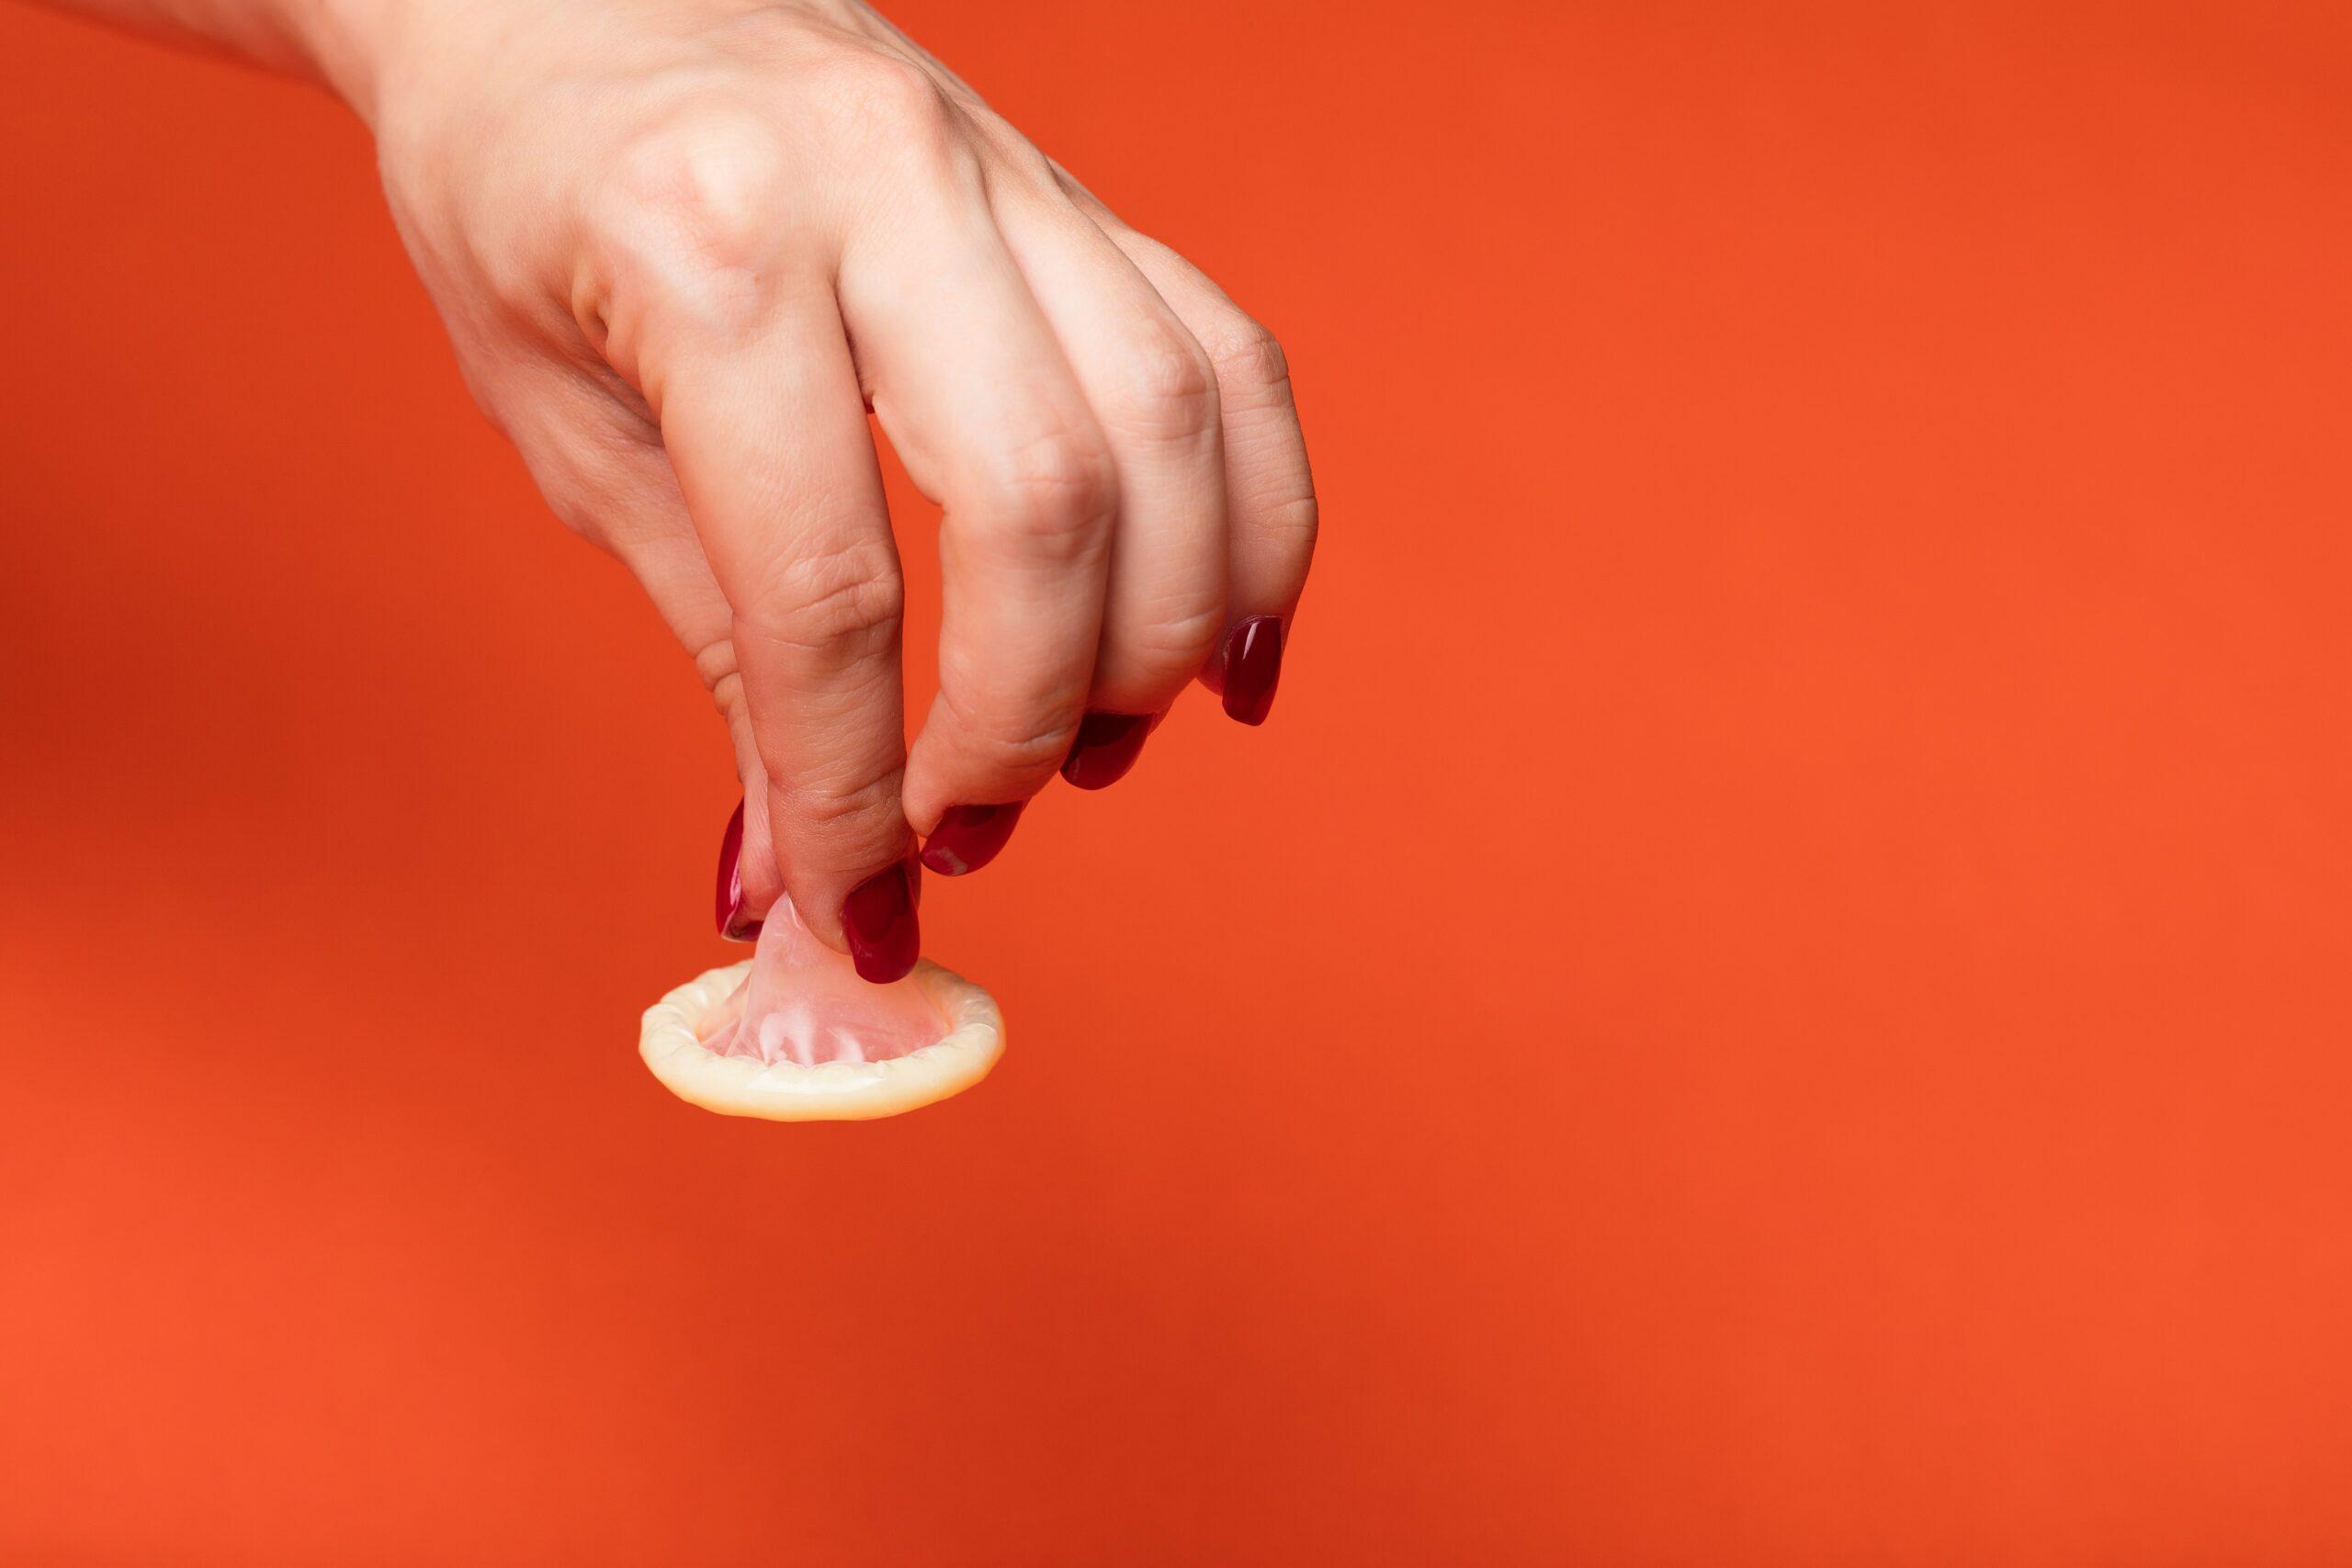 Condom use and STD/STIs